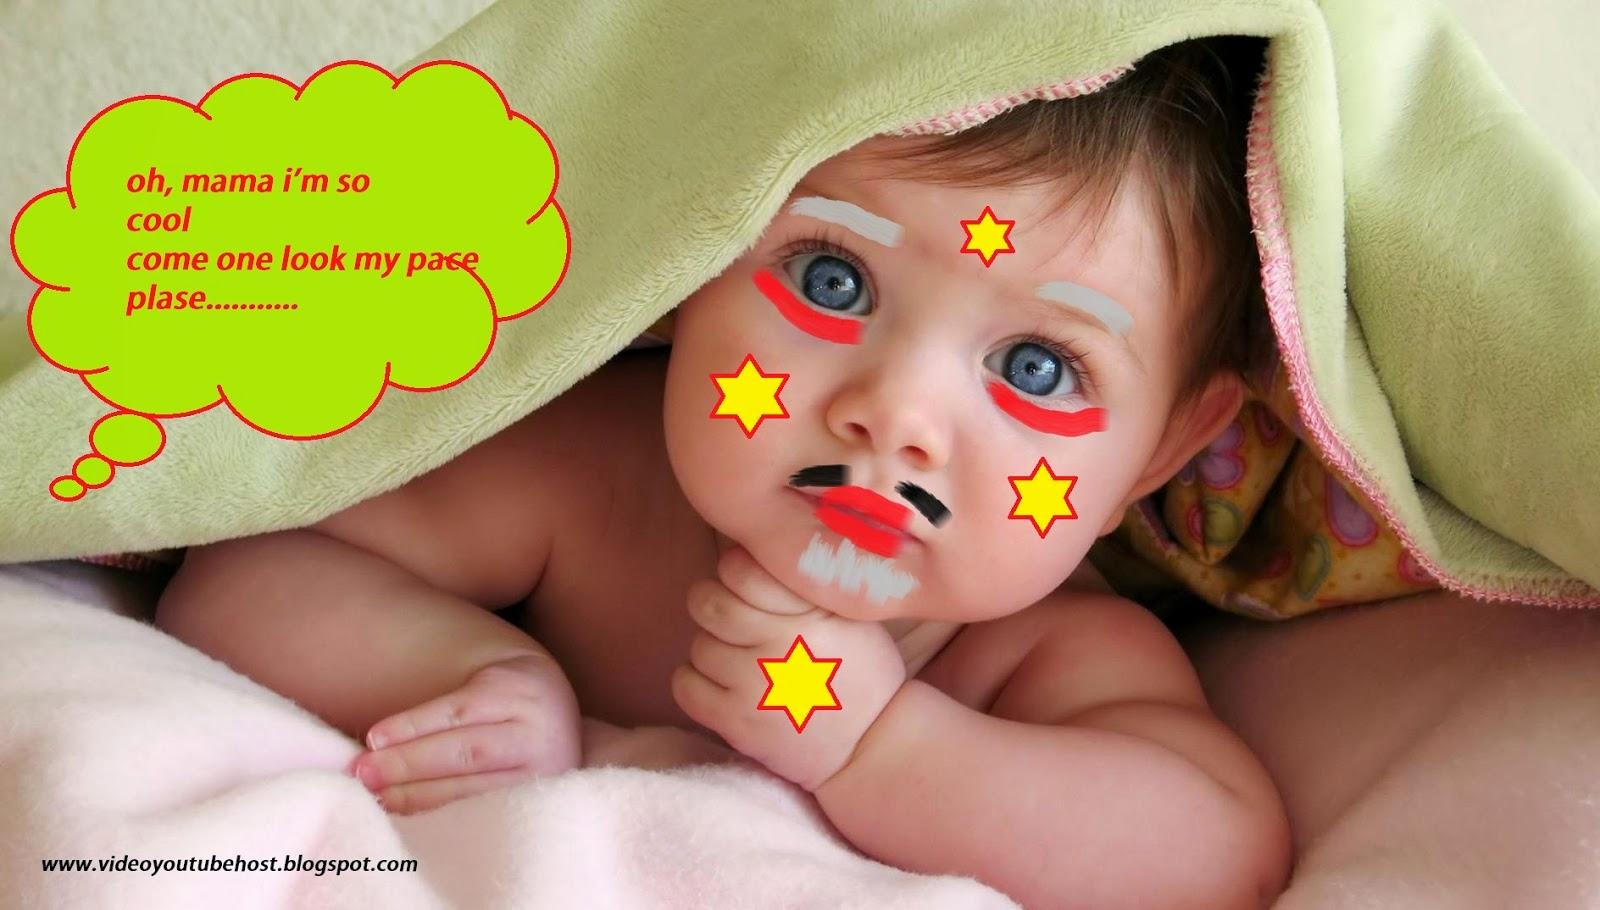 Kumpulan gambar bayi Lucu Imut  Funny and Cute baby images